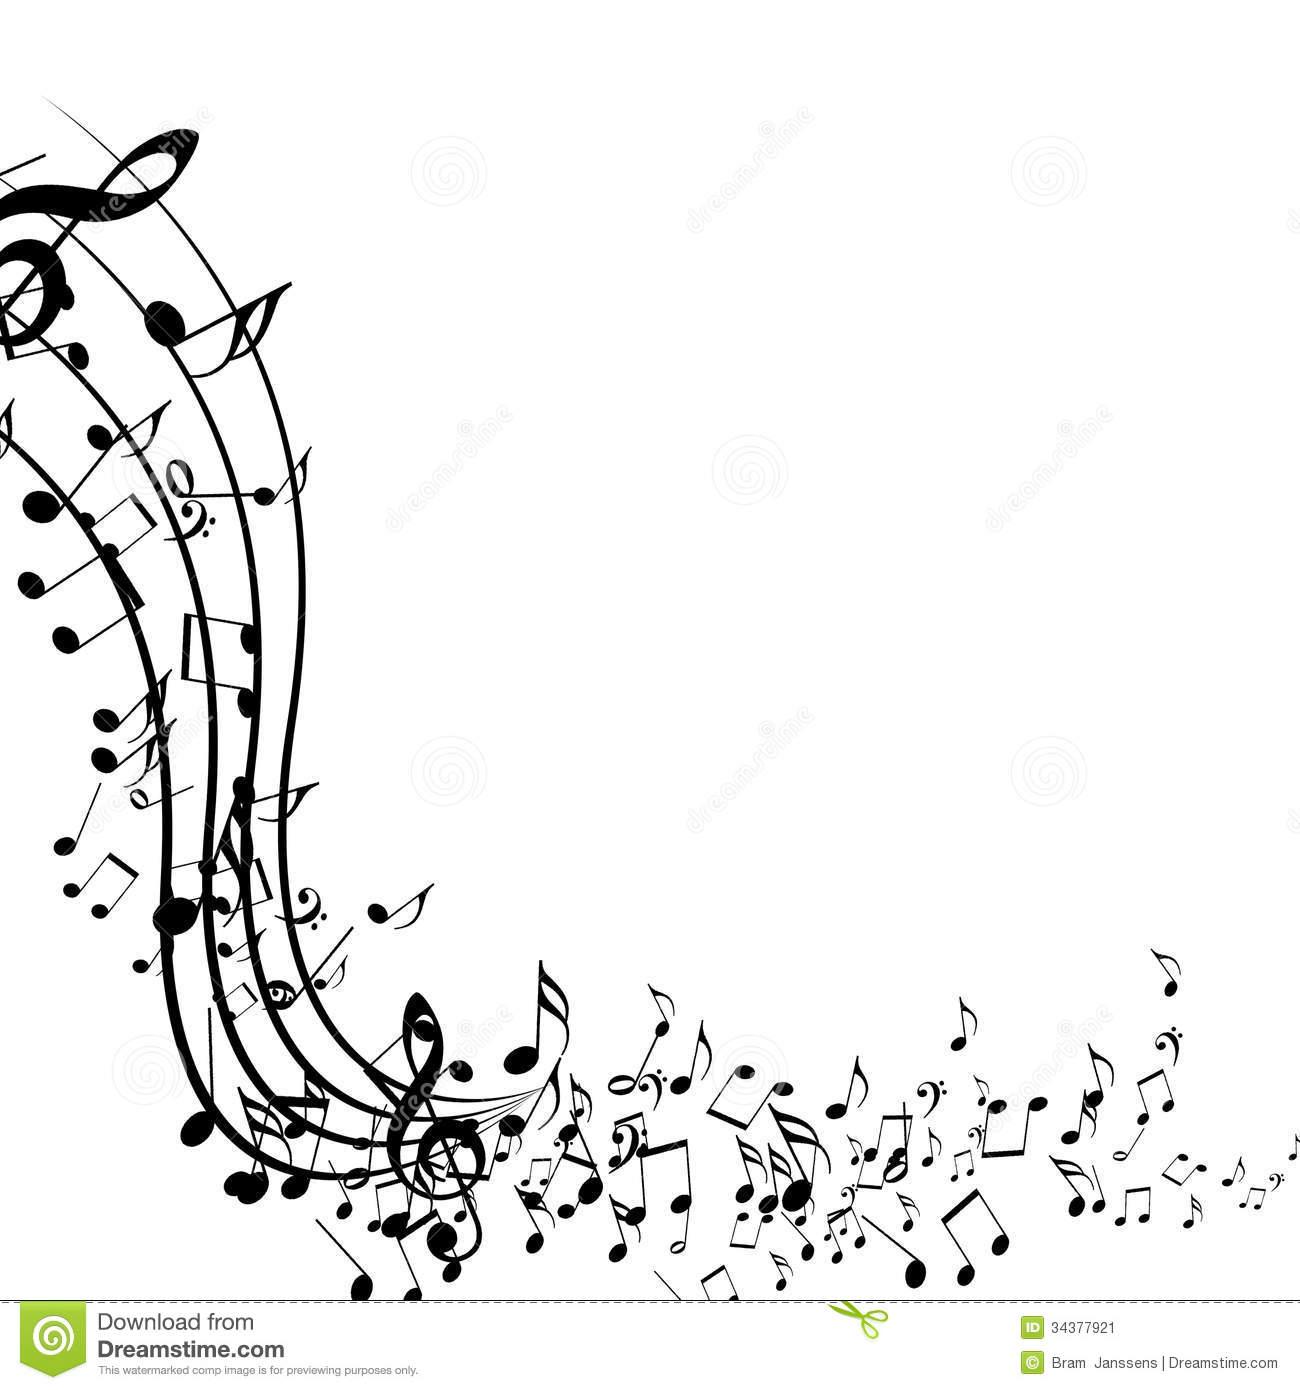 Music wallpaper black and white.